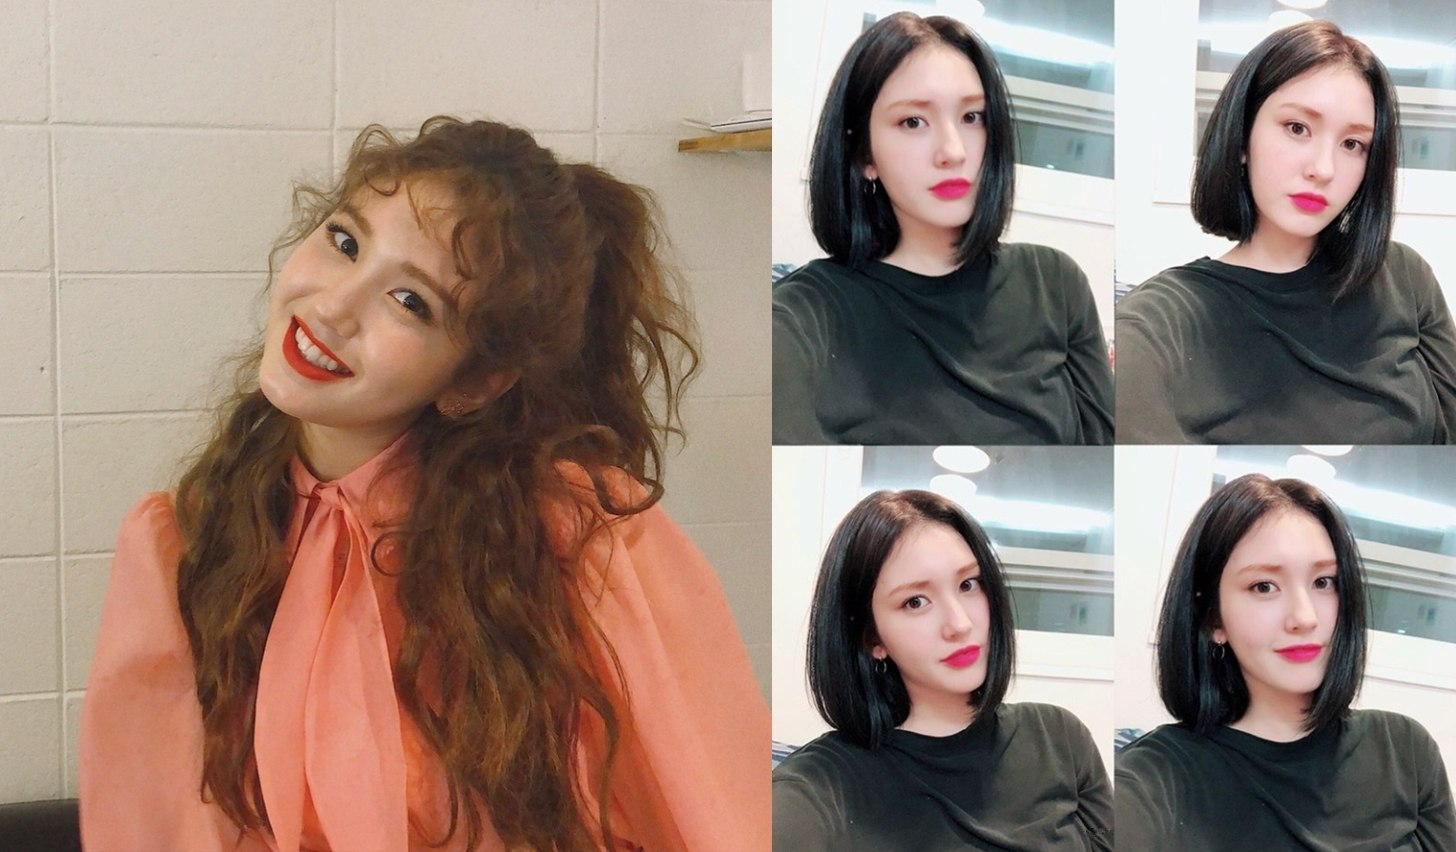 1. Somi 一直以來都有一頭長捲髮的Somi,之前也是剪掉一頭長髮,不過她本人似乎很開心可以剪掉受損的頭髮呢XD